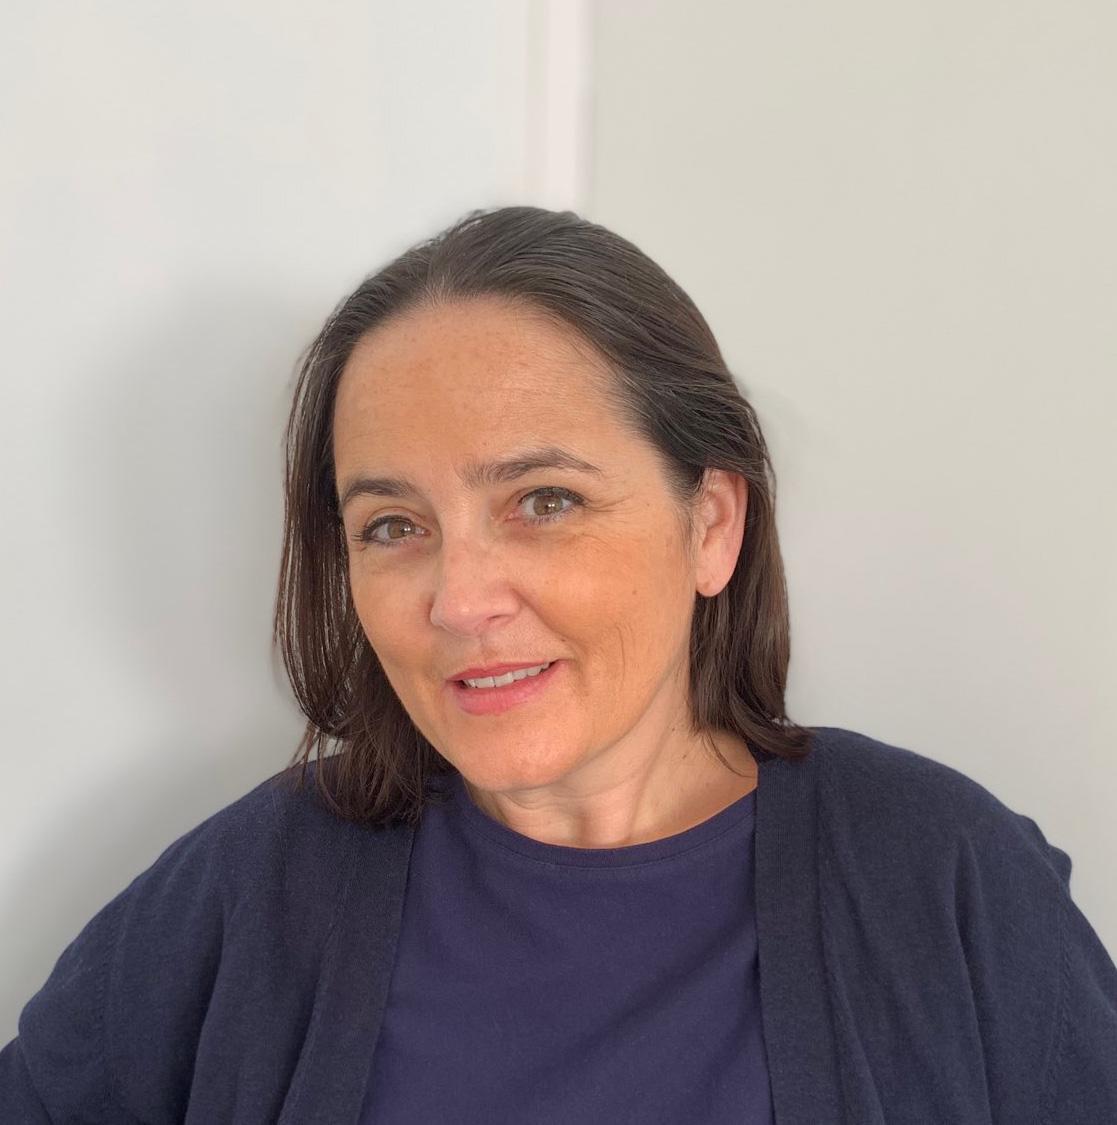 Karine Pichereau